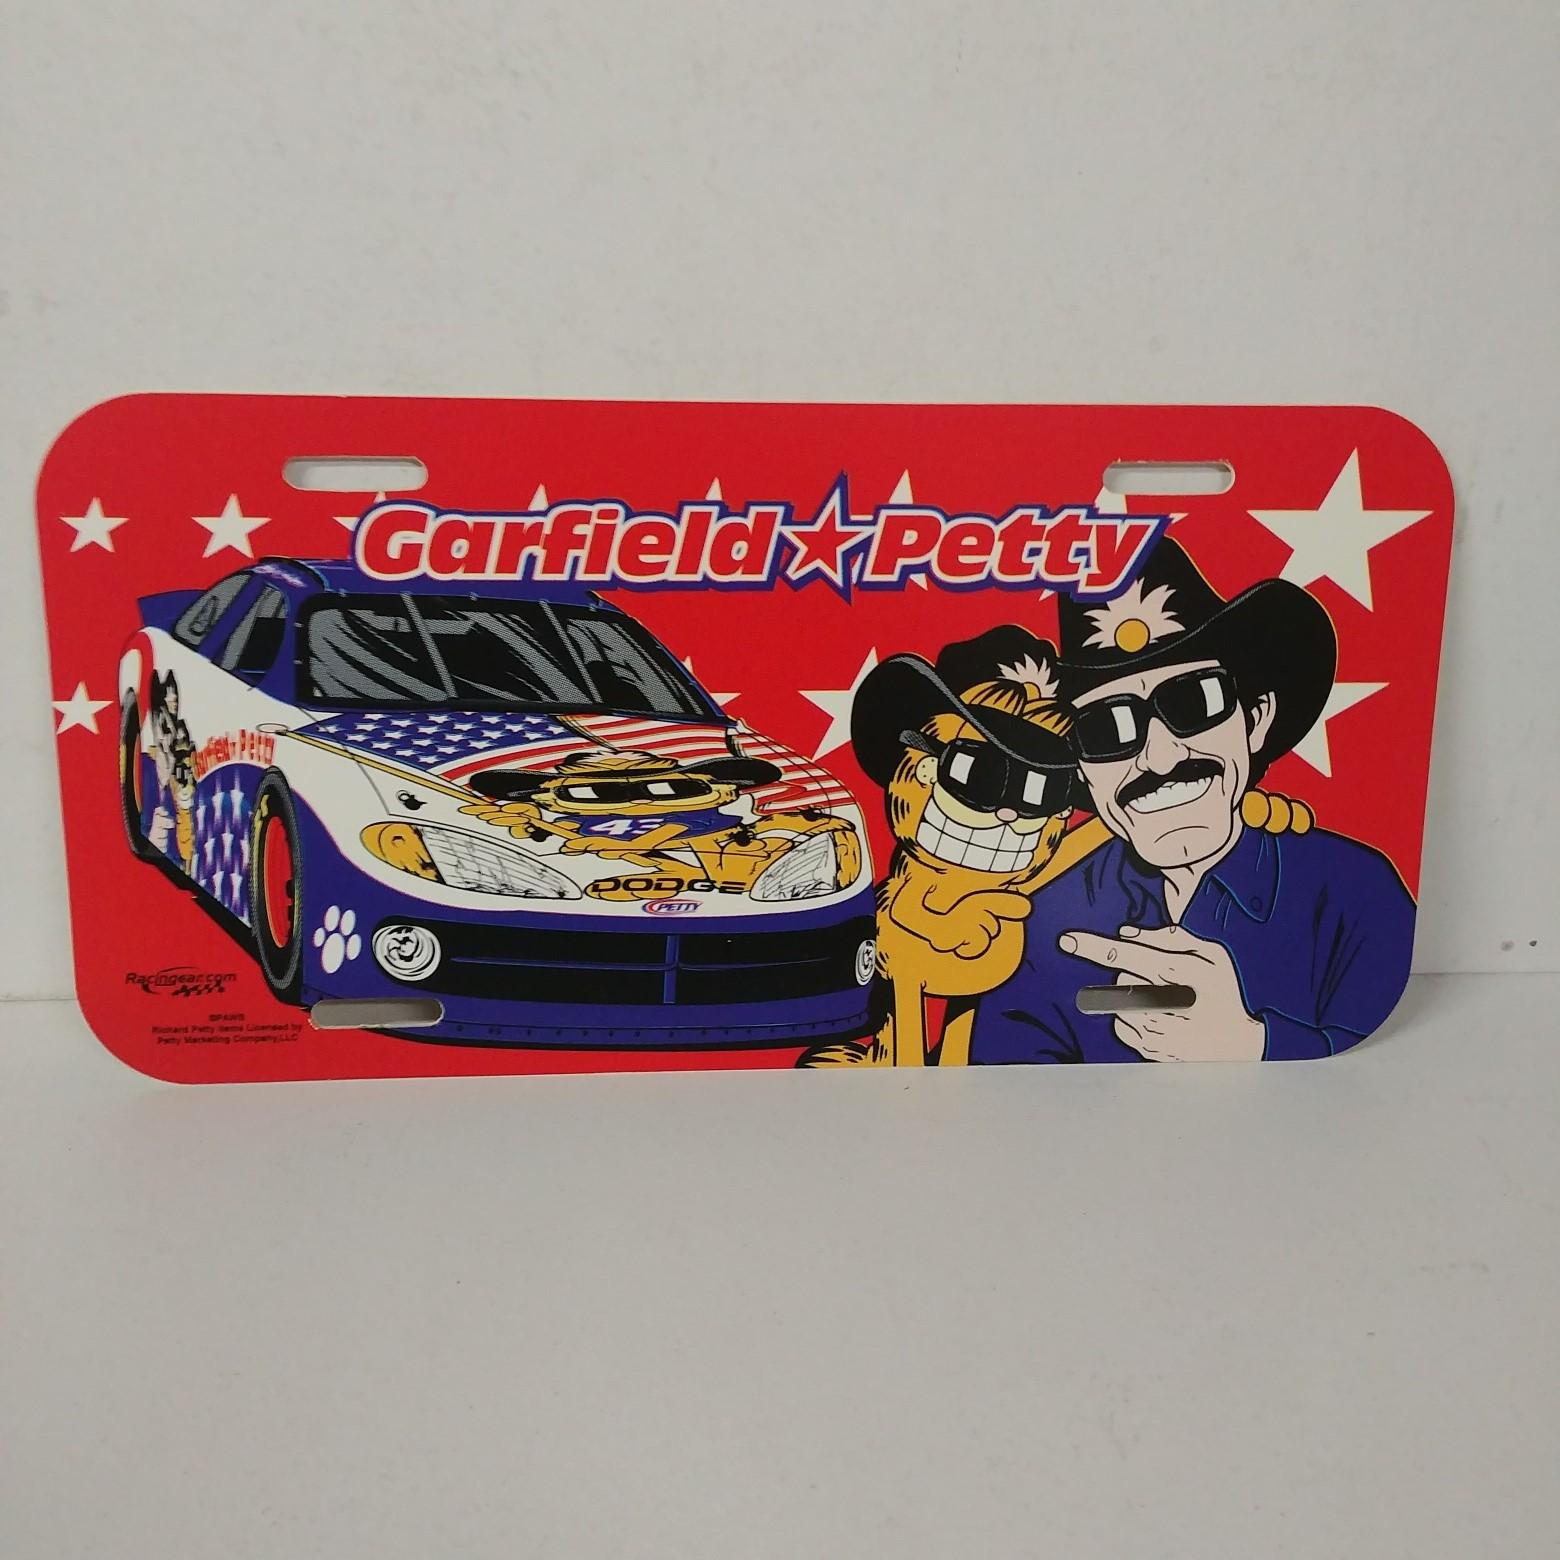 2002 Richard Petty Garfield and Petty plastic license plate